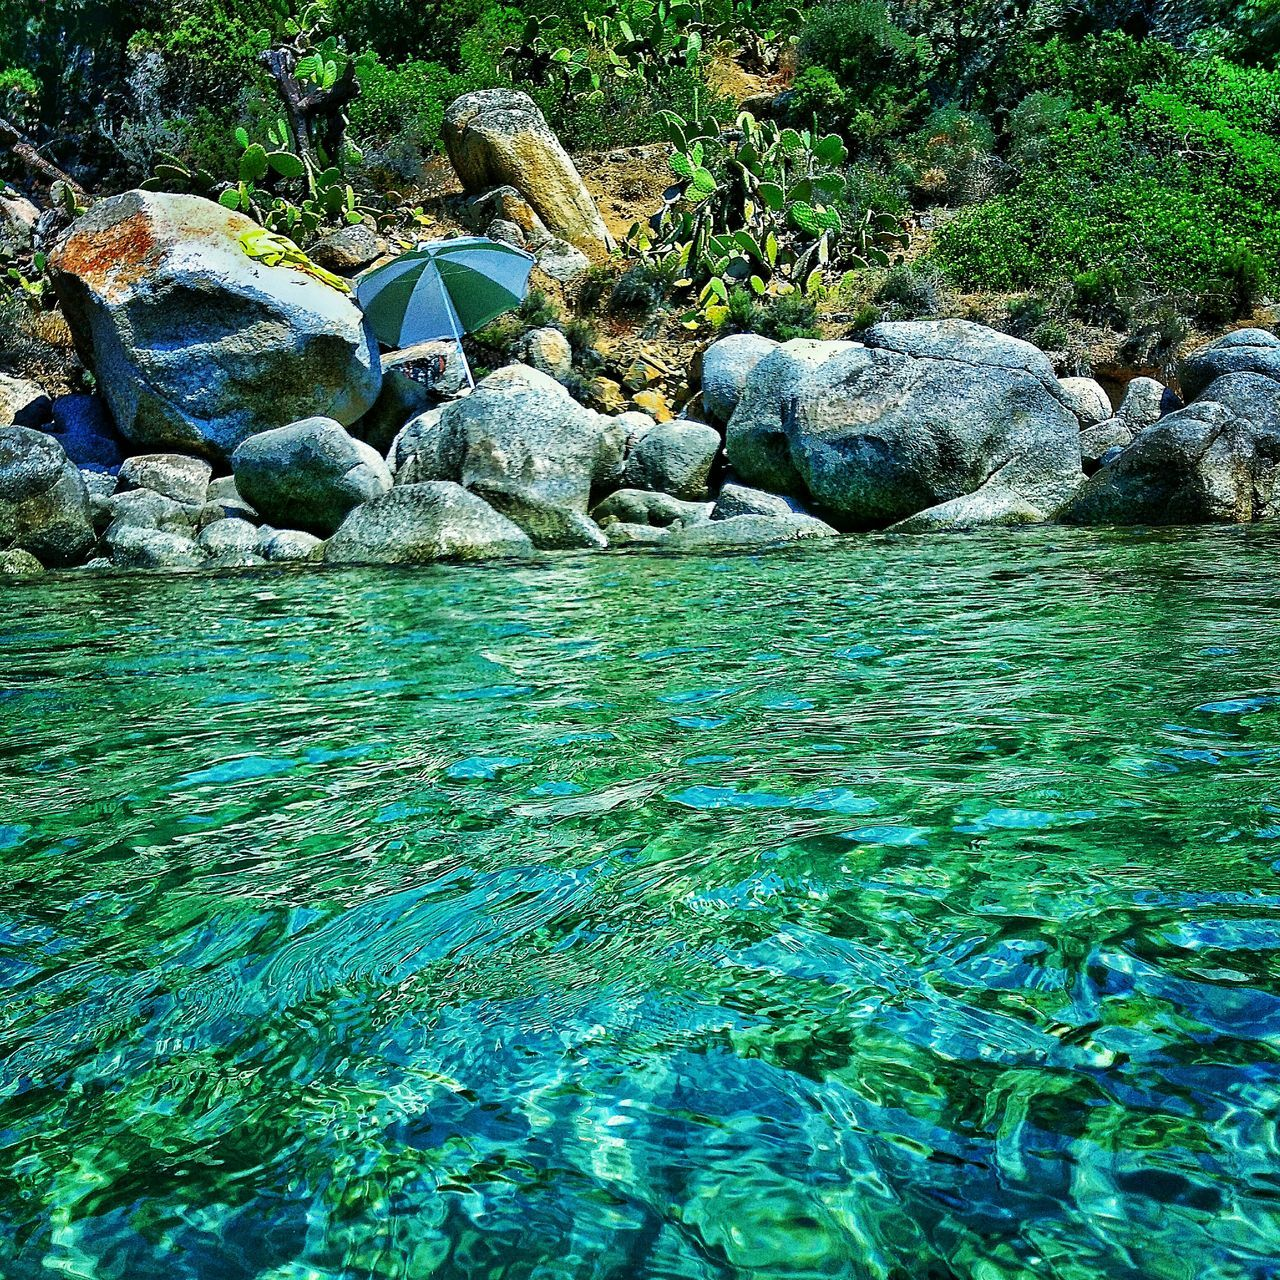 Inthewater Sardegna Estate2015 Summer Sardinia Fromwatertoland Cristal Water